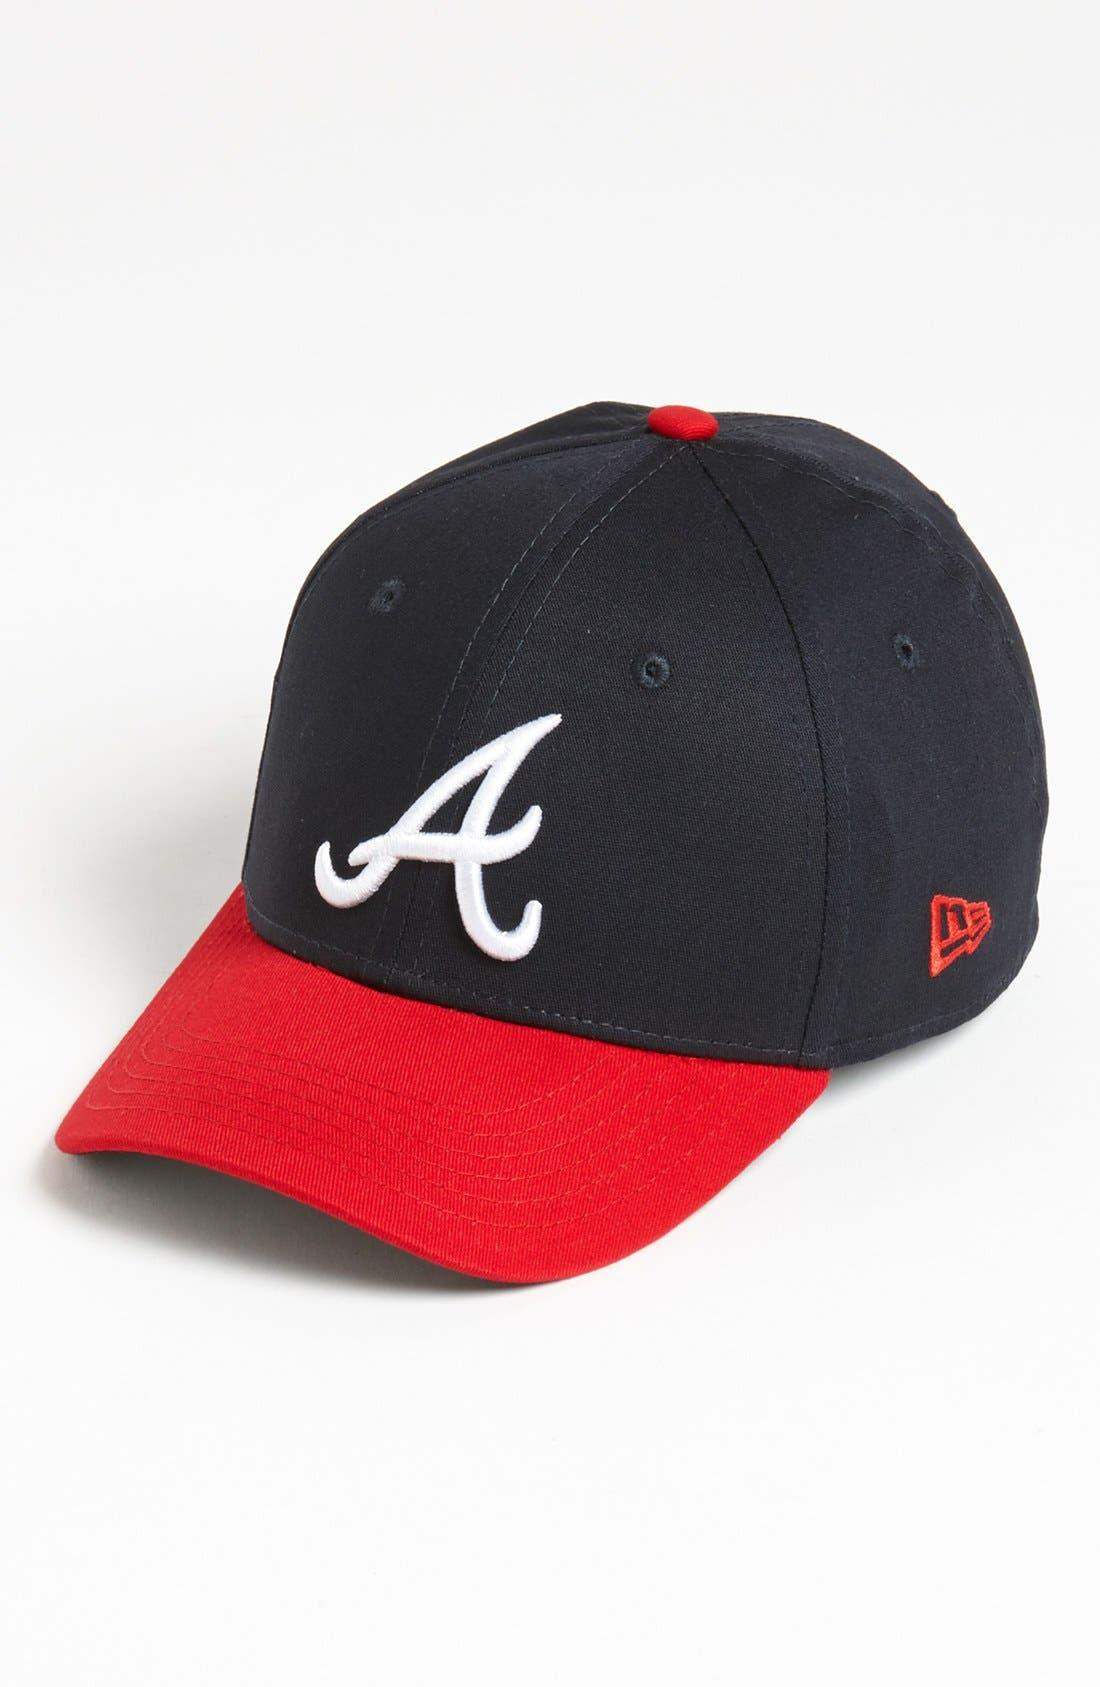 Alternate Image 1 Selected - New Era Cap 'Atlanta Braves - Tie Breaker' Baseball Cap (Big Boys)